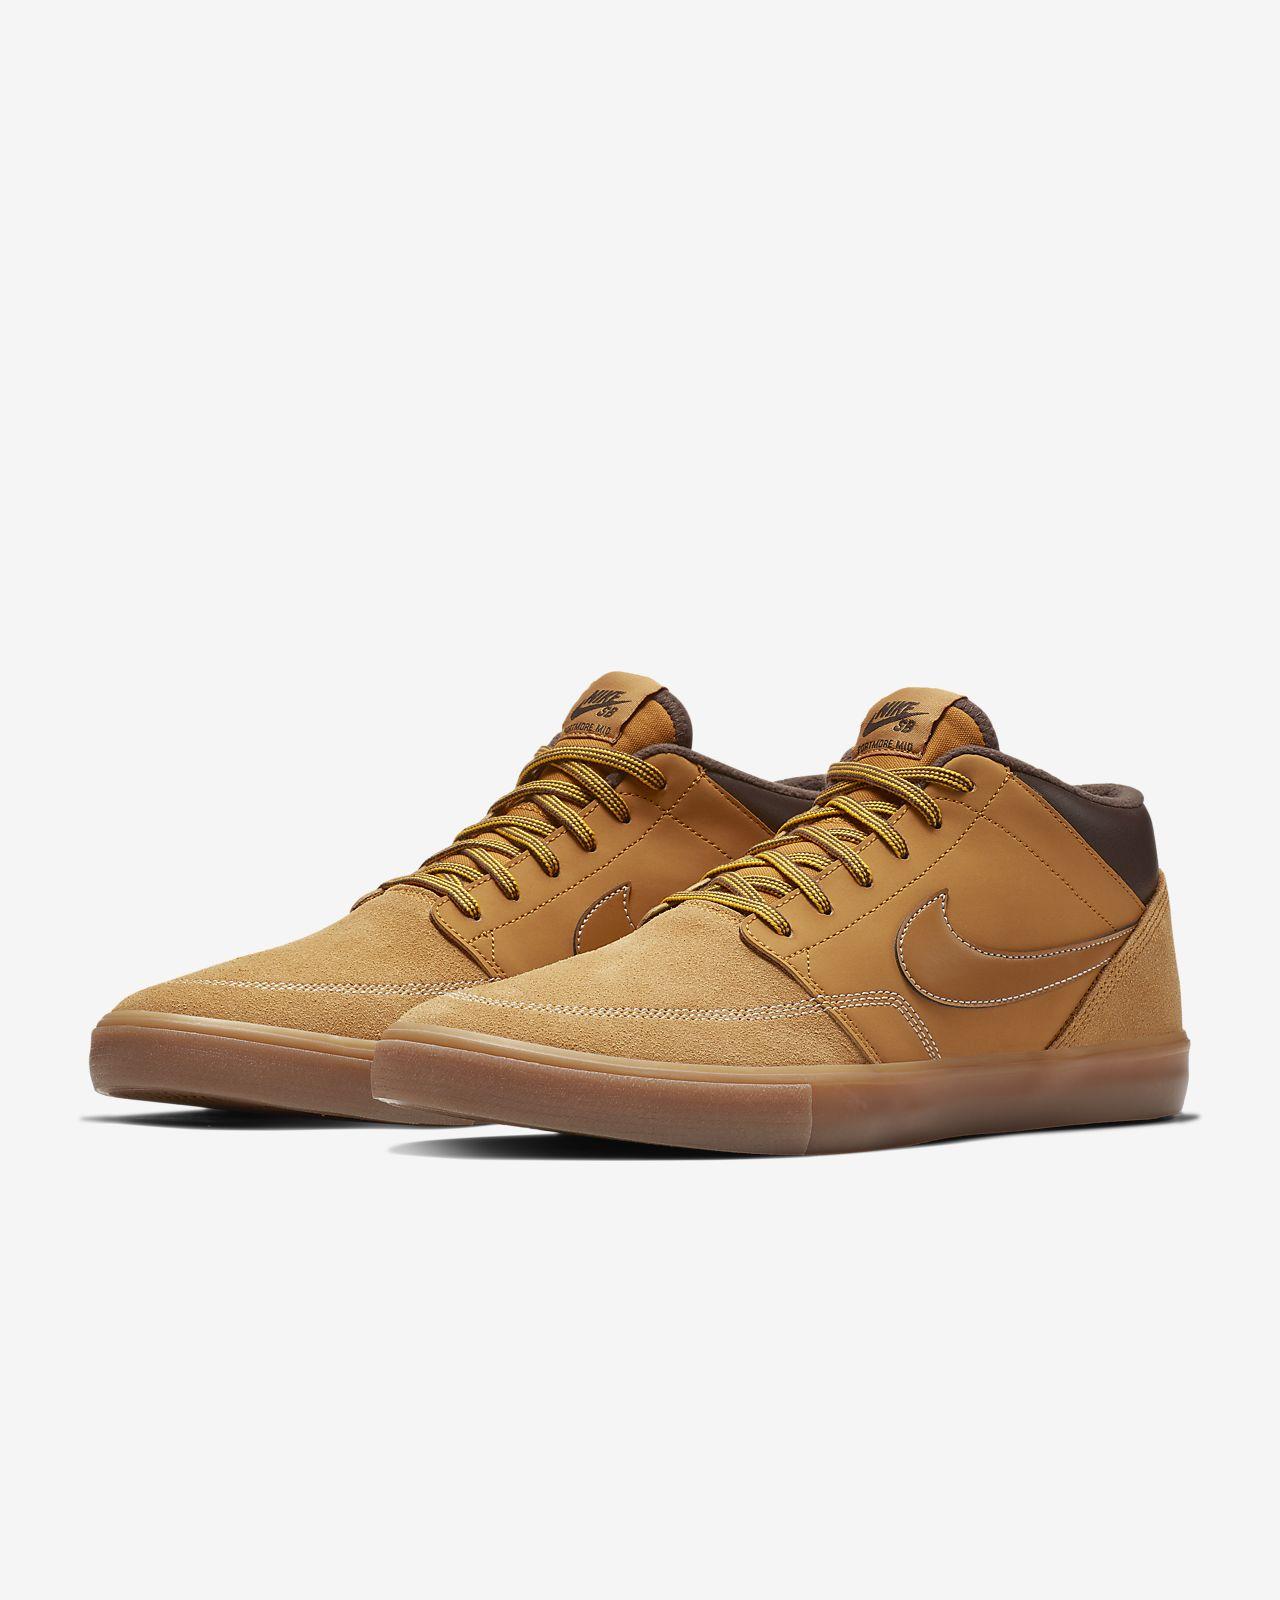 831a2276d56b03 Nike SB Portmore II Solarsoft Mid Bota Skateboarding Shoe. Nike.com AU